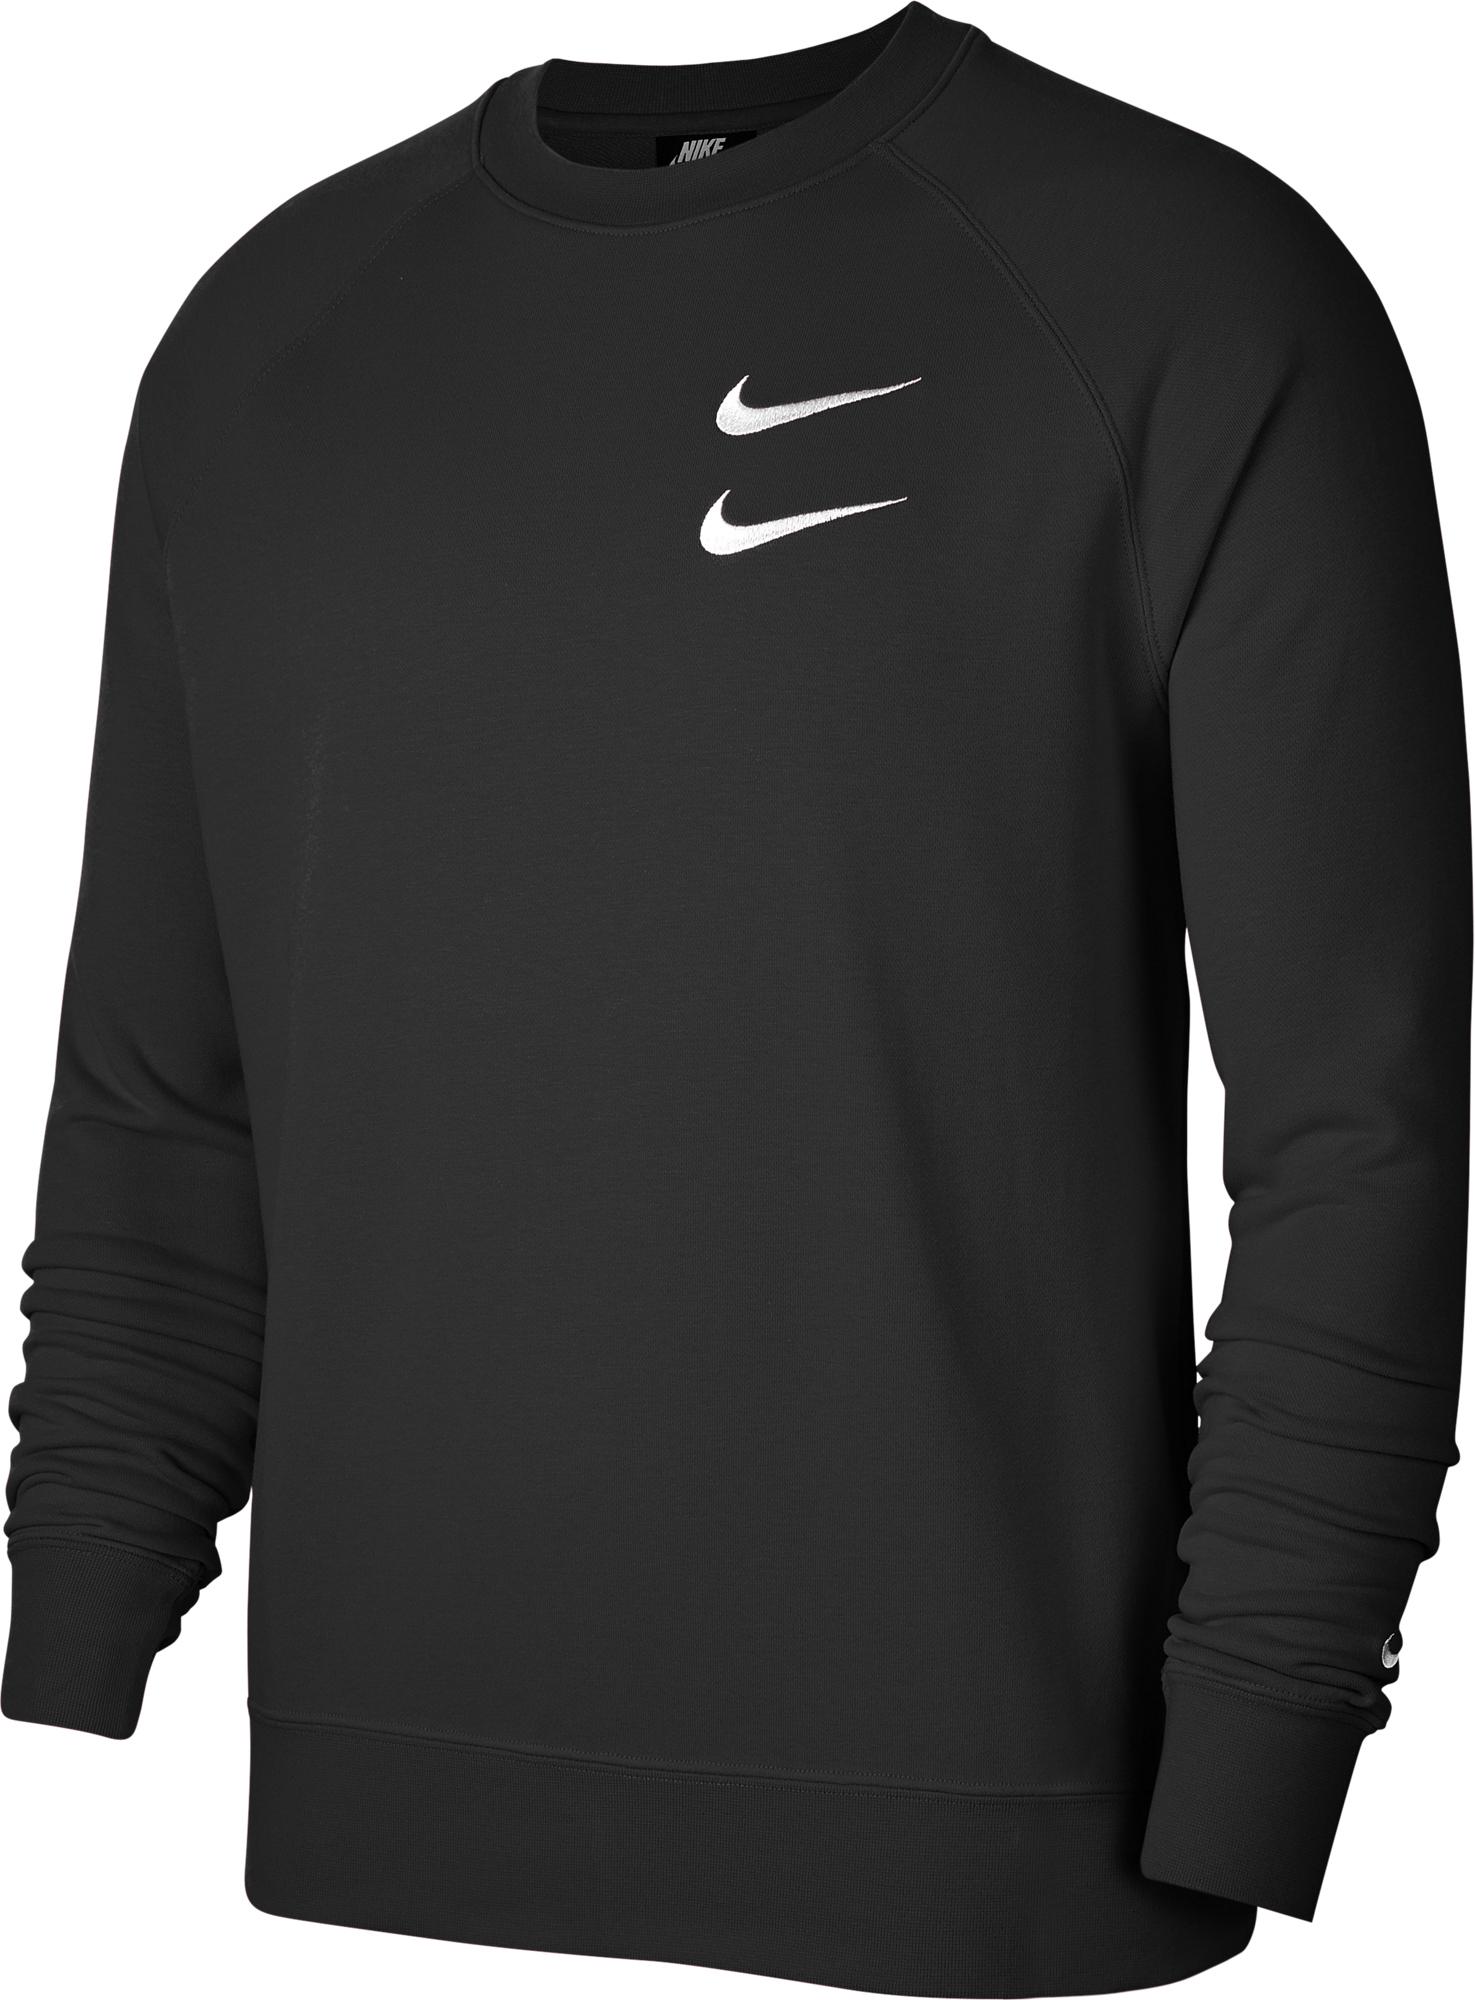 цена Nike Свитшот мужской Nike Sportswear Swoosh, размер 50-52 онлайн в 2017 году